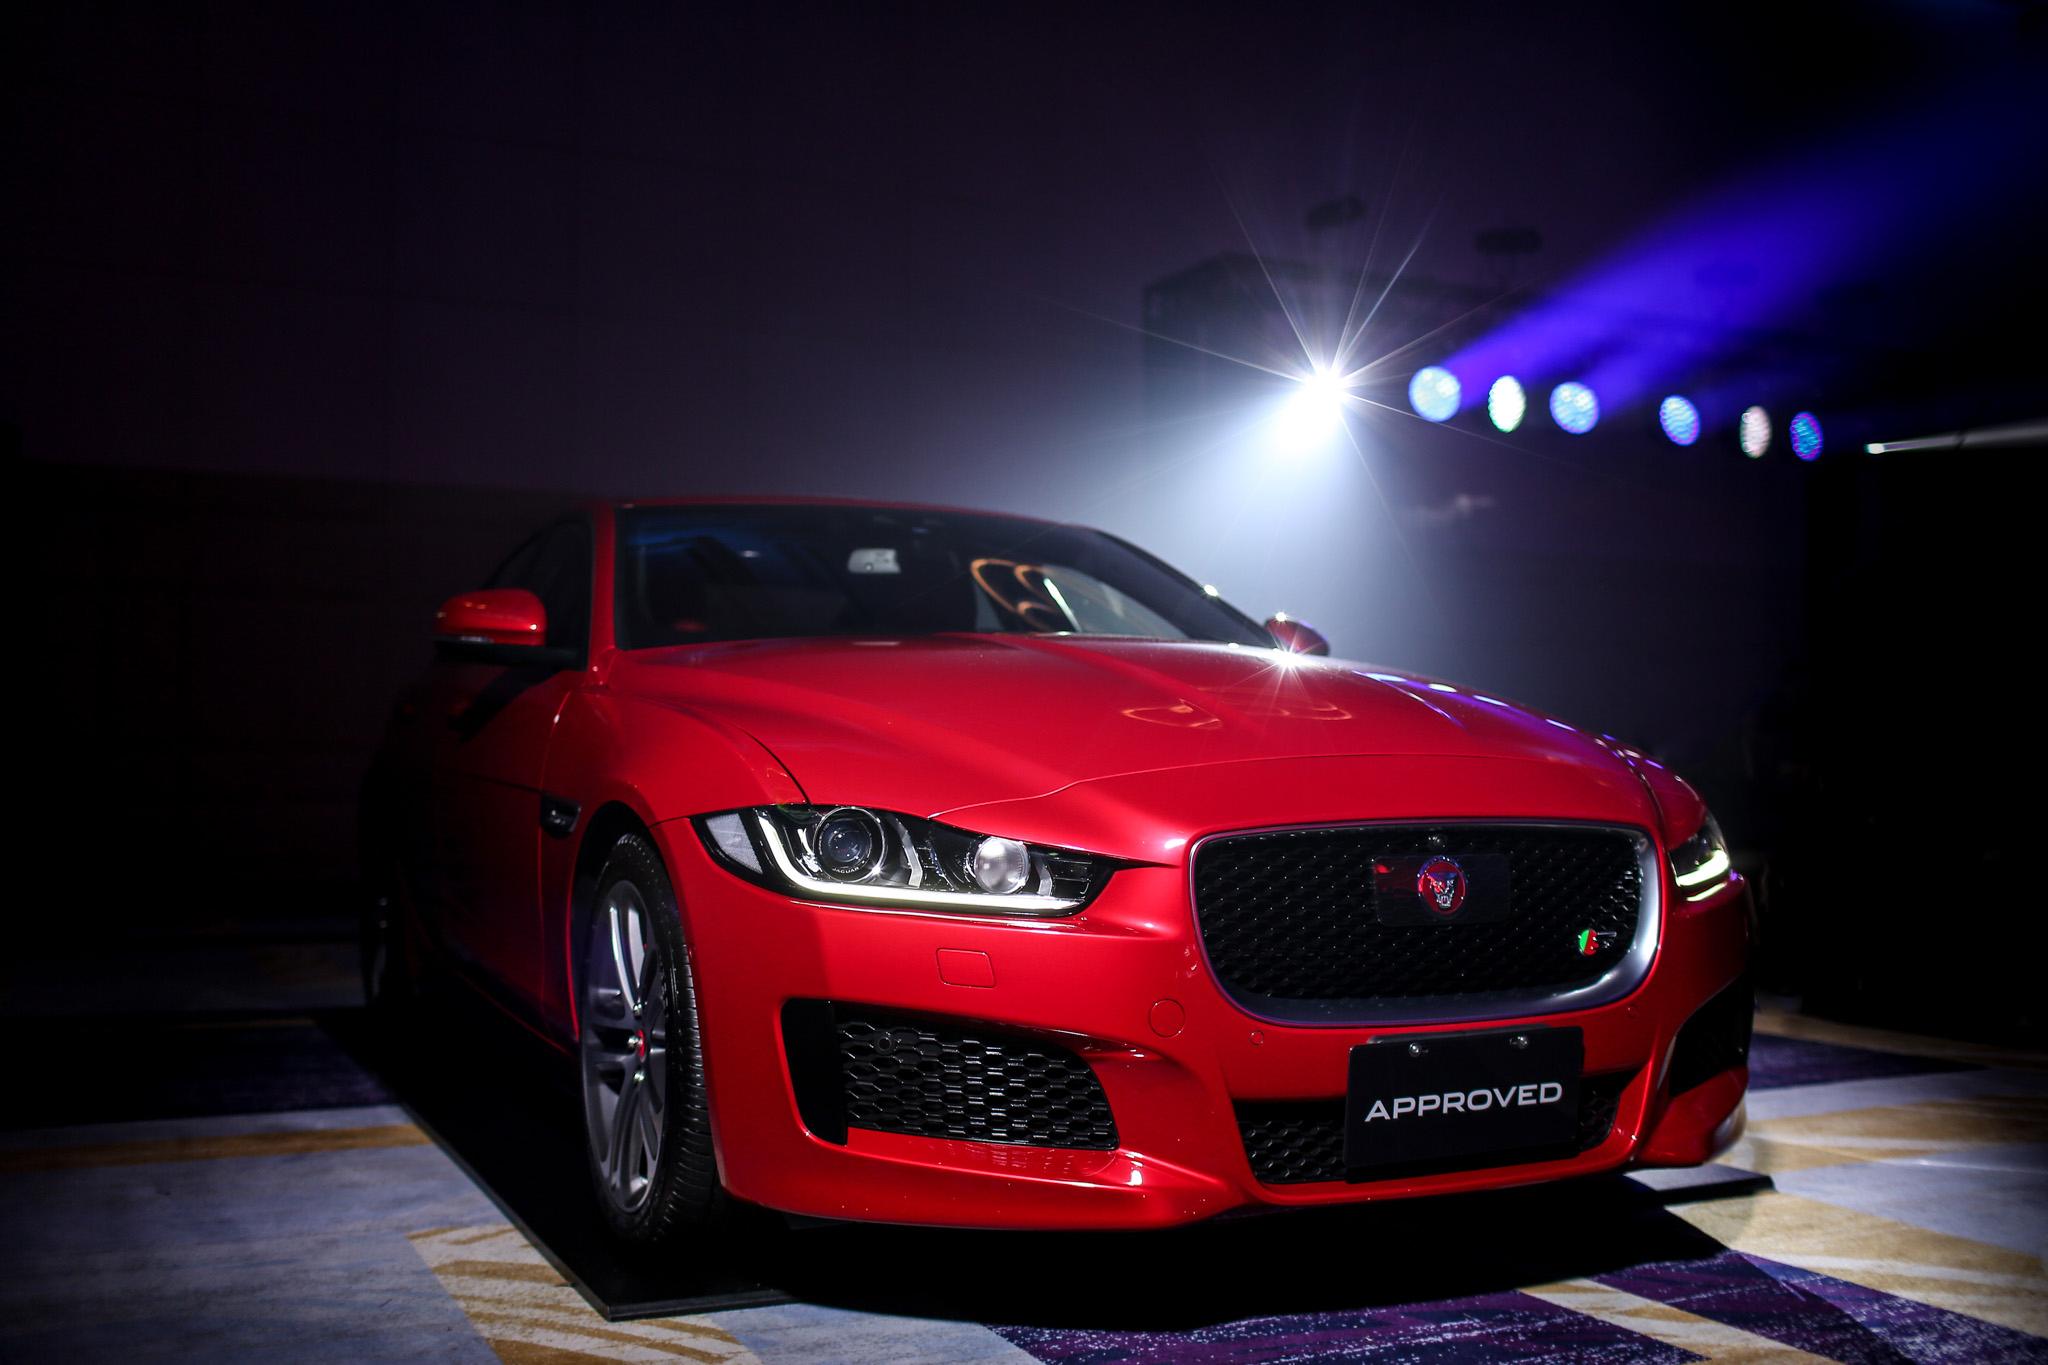 Jaguar Land Rover 海外事業部總裁 Dmitry Kolchanov (圖2左) 、APIO亞太市場總裁Robin Colgan(圖2右) 與Jaguar Land Rover台灣總代理九和汽車總經理陳貽彬(圖2中)共同宣布台灣市場全新策略佈局。